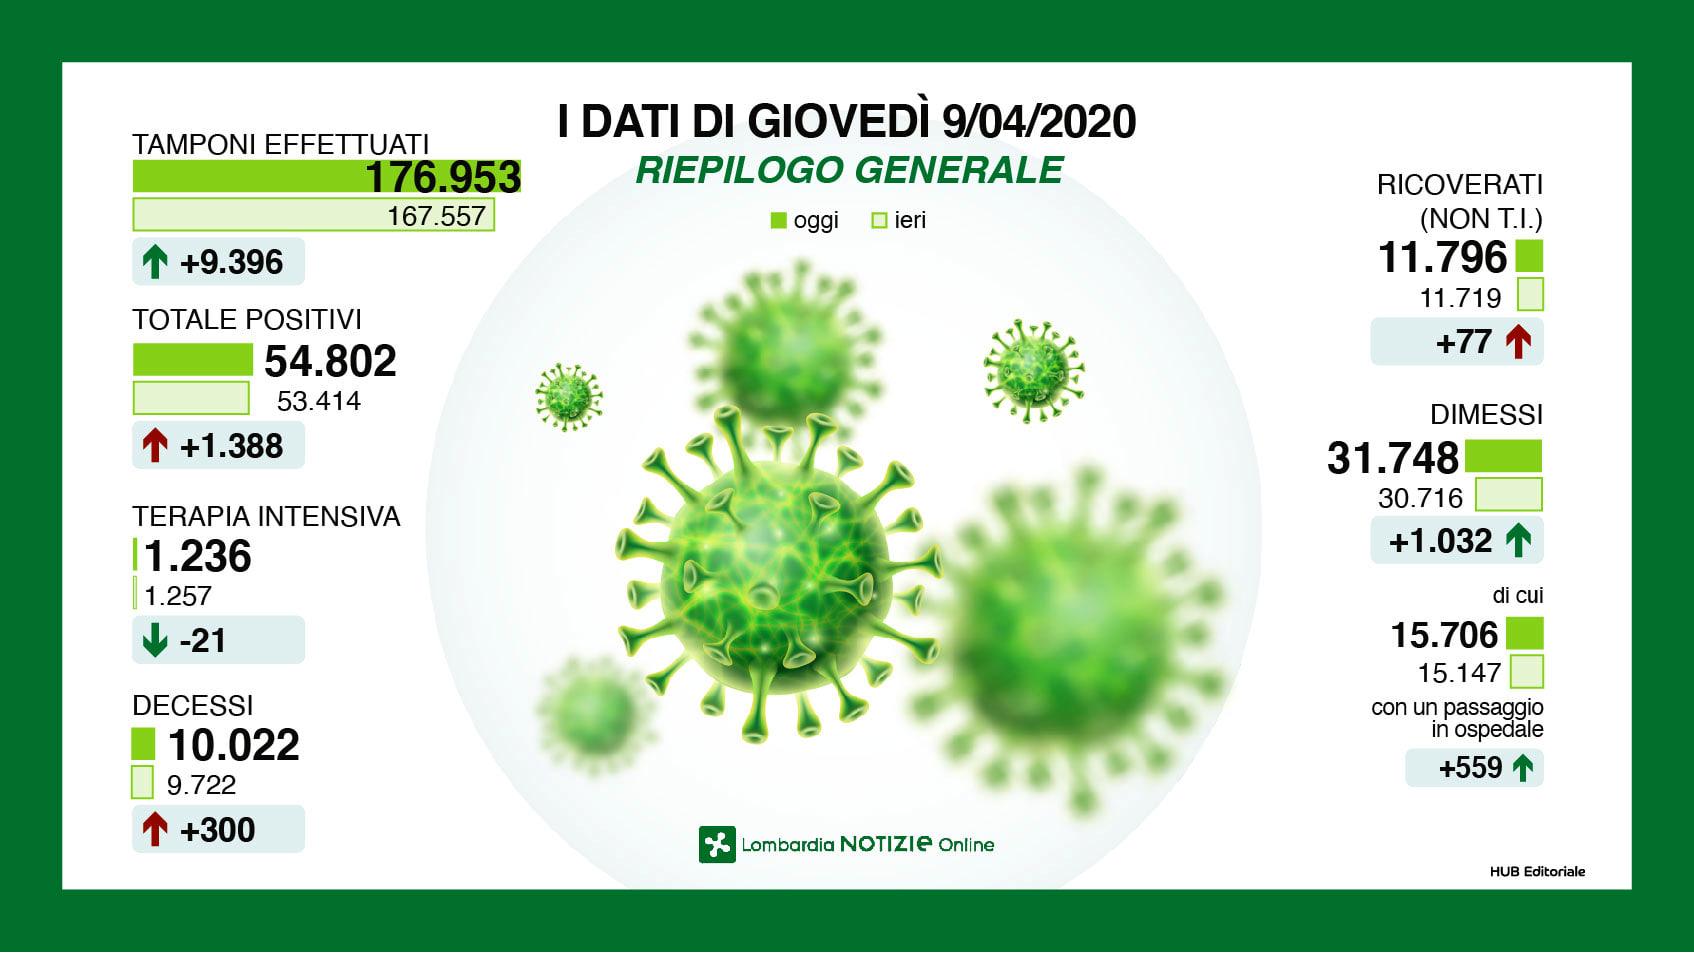 infografica coronavirus lombardia 9 aprile 20201-2